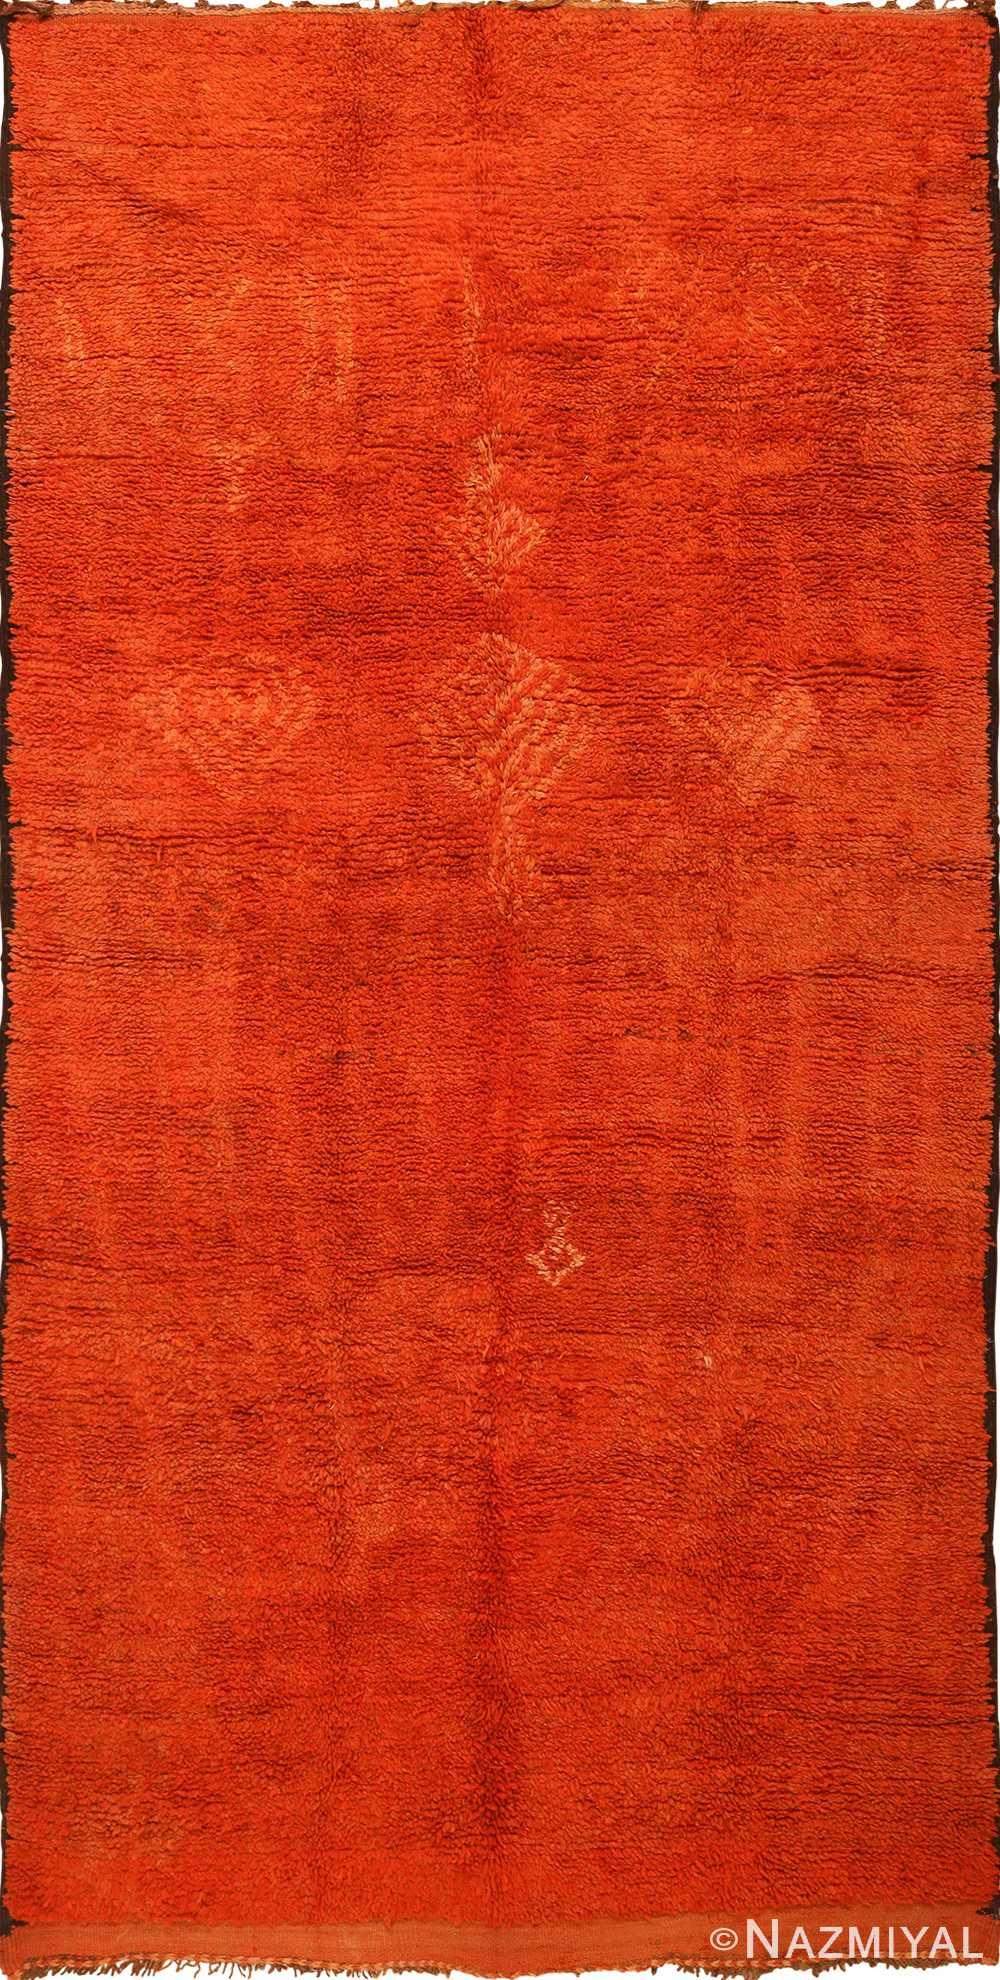 Burnt Orange Vintage Shaggy Berber Moroccan Rug 49868 By